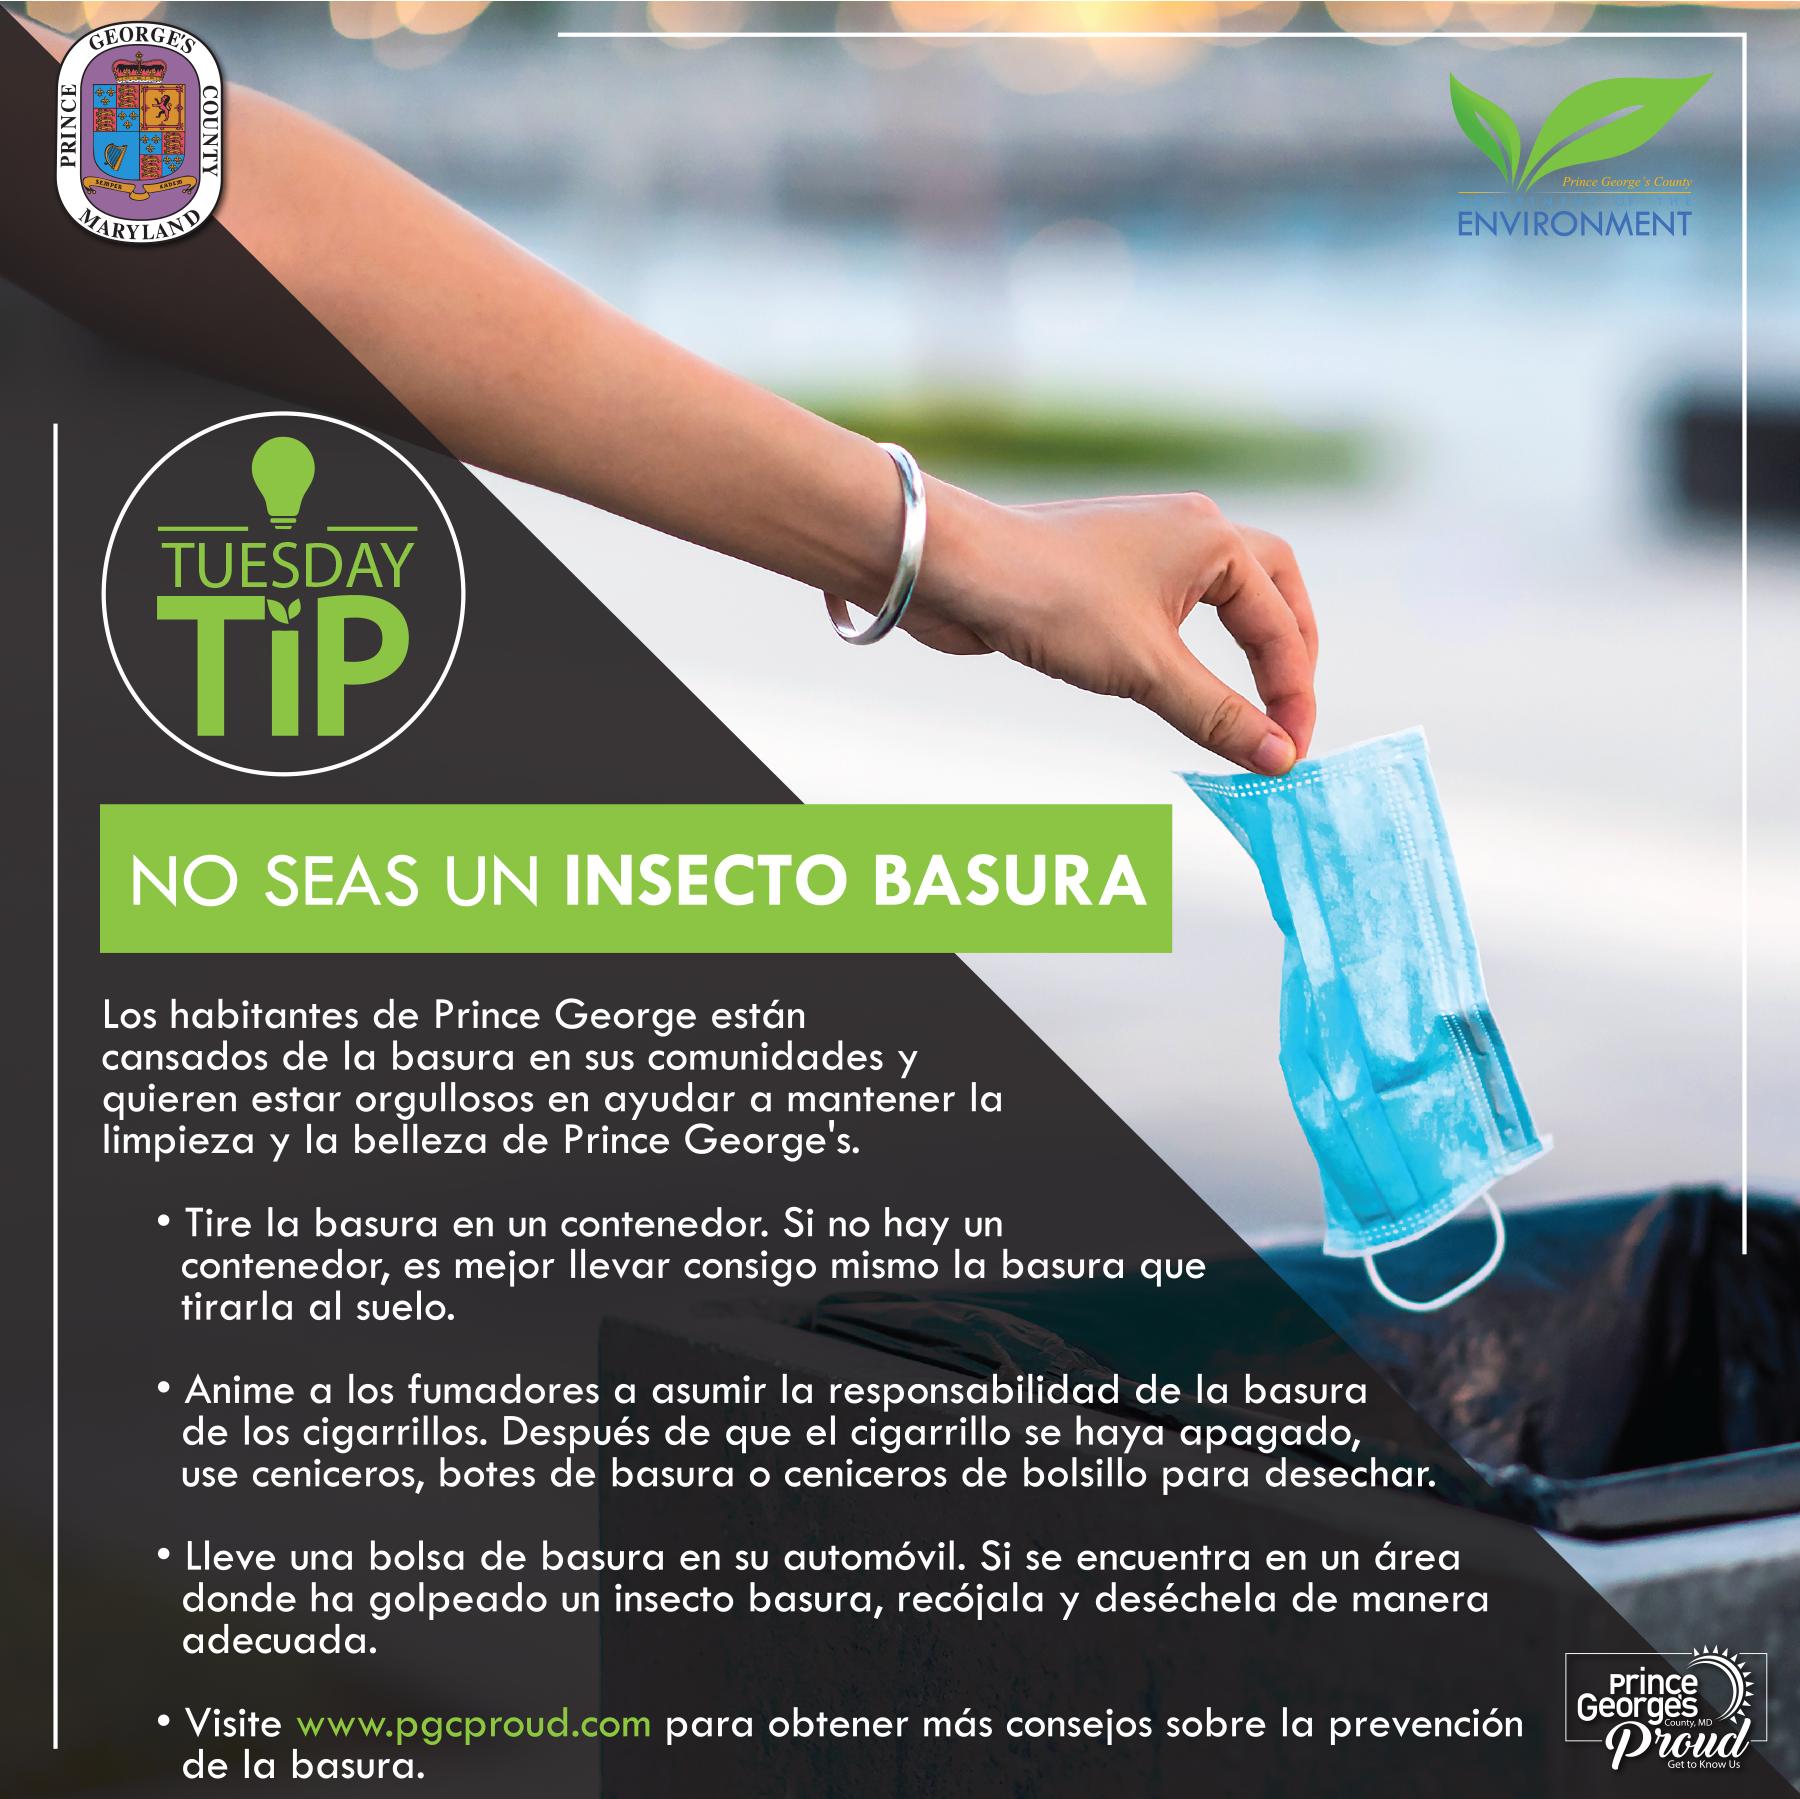 Tues Tip 6.15.21 litterbug sp